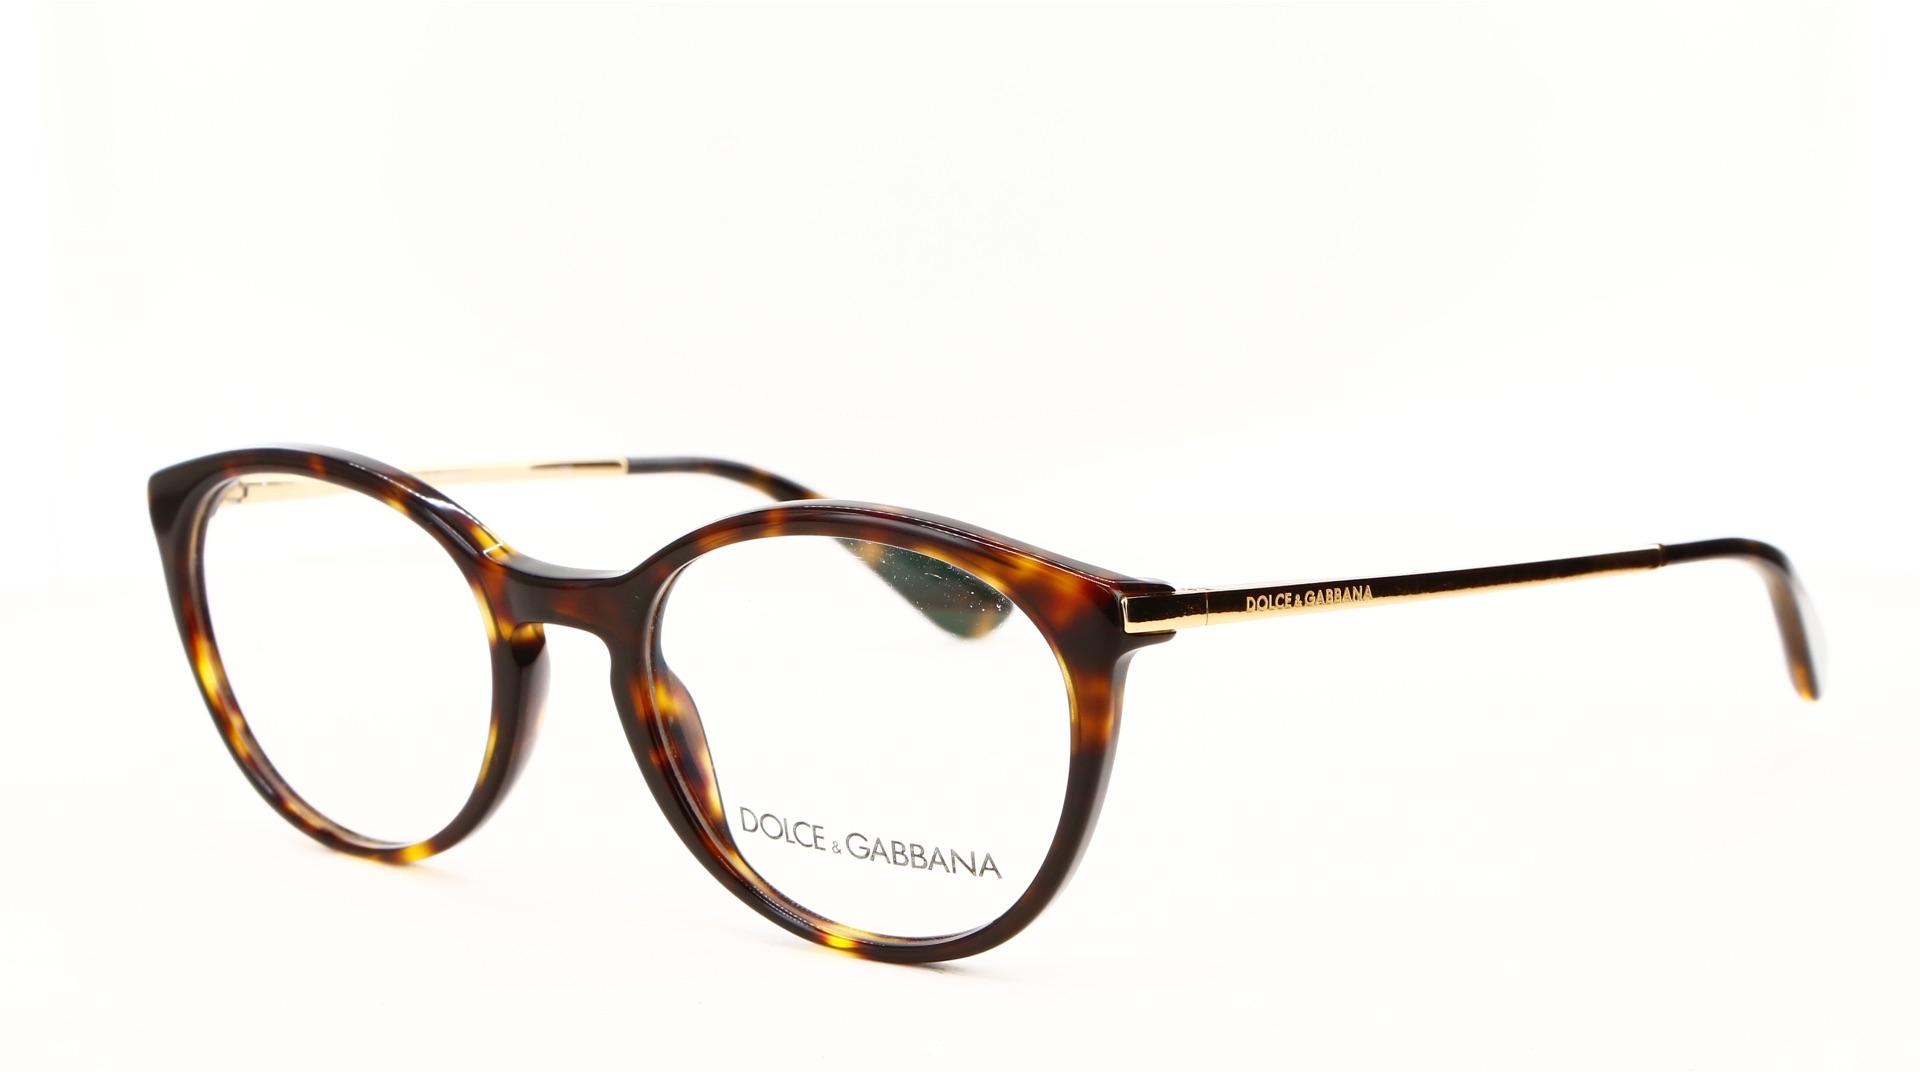 Dolce & Gabbana - ref: 74386